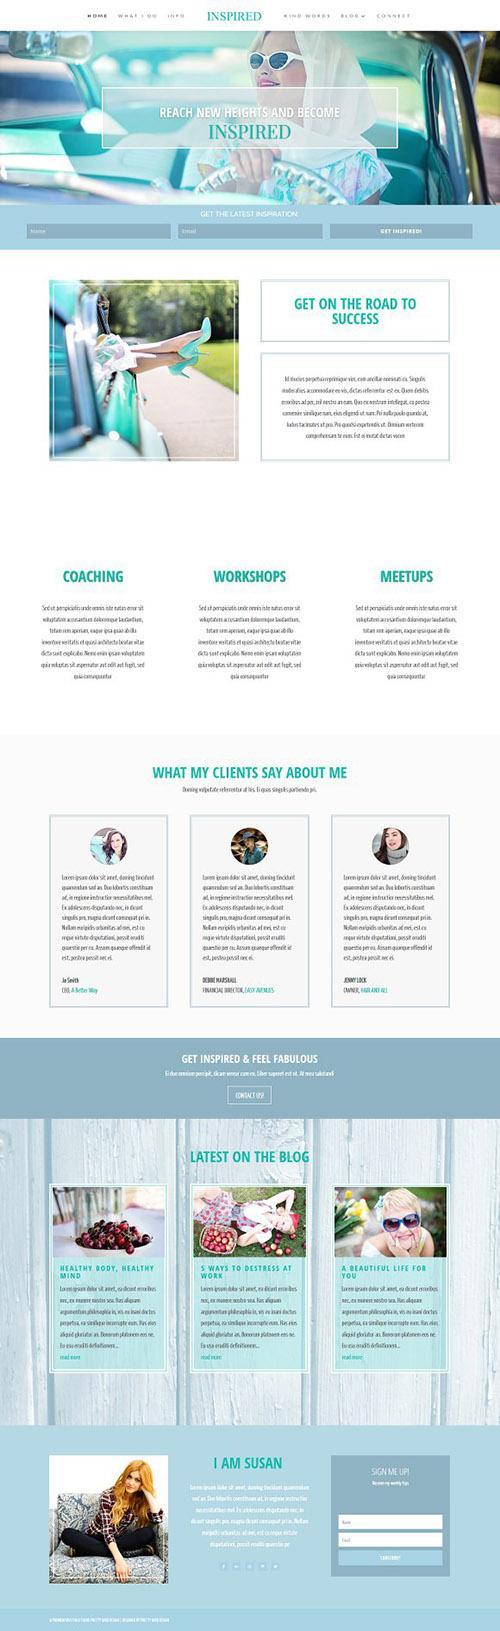 Inspired v1.0 - WordPress Blog Theme - CM 1685182